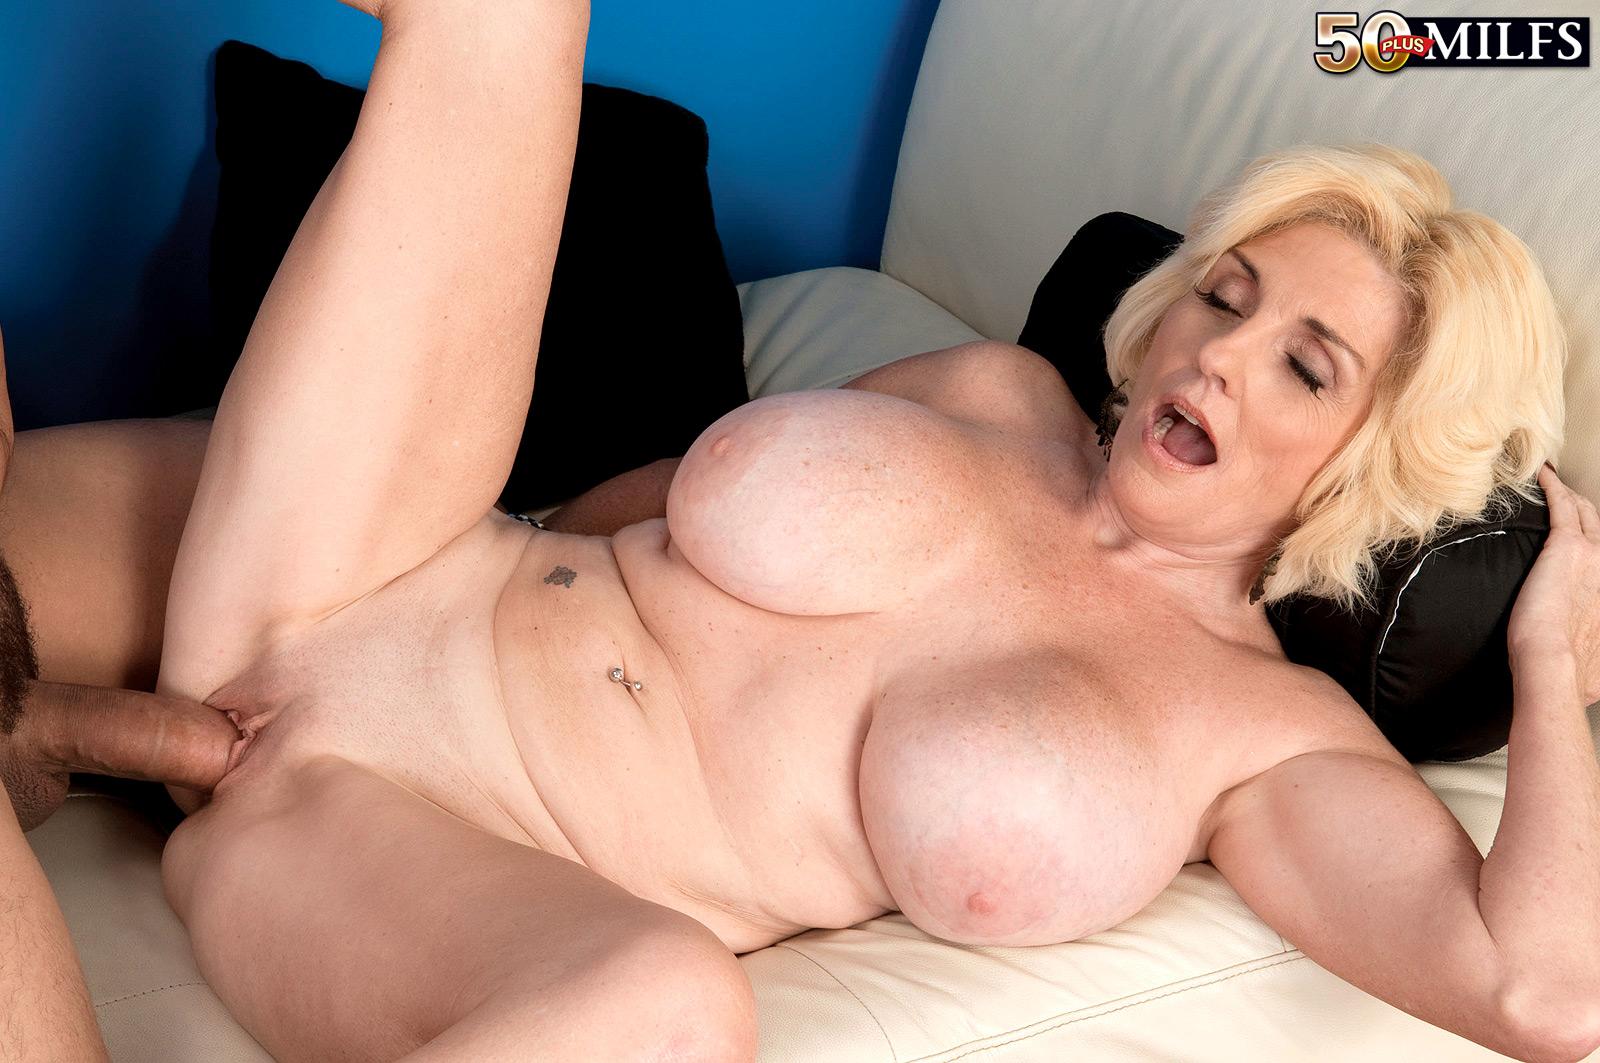 Missy thompson porn